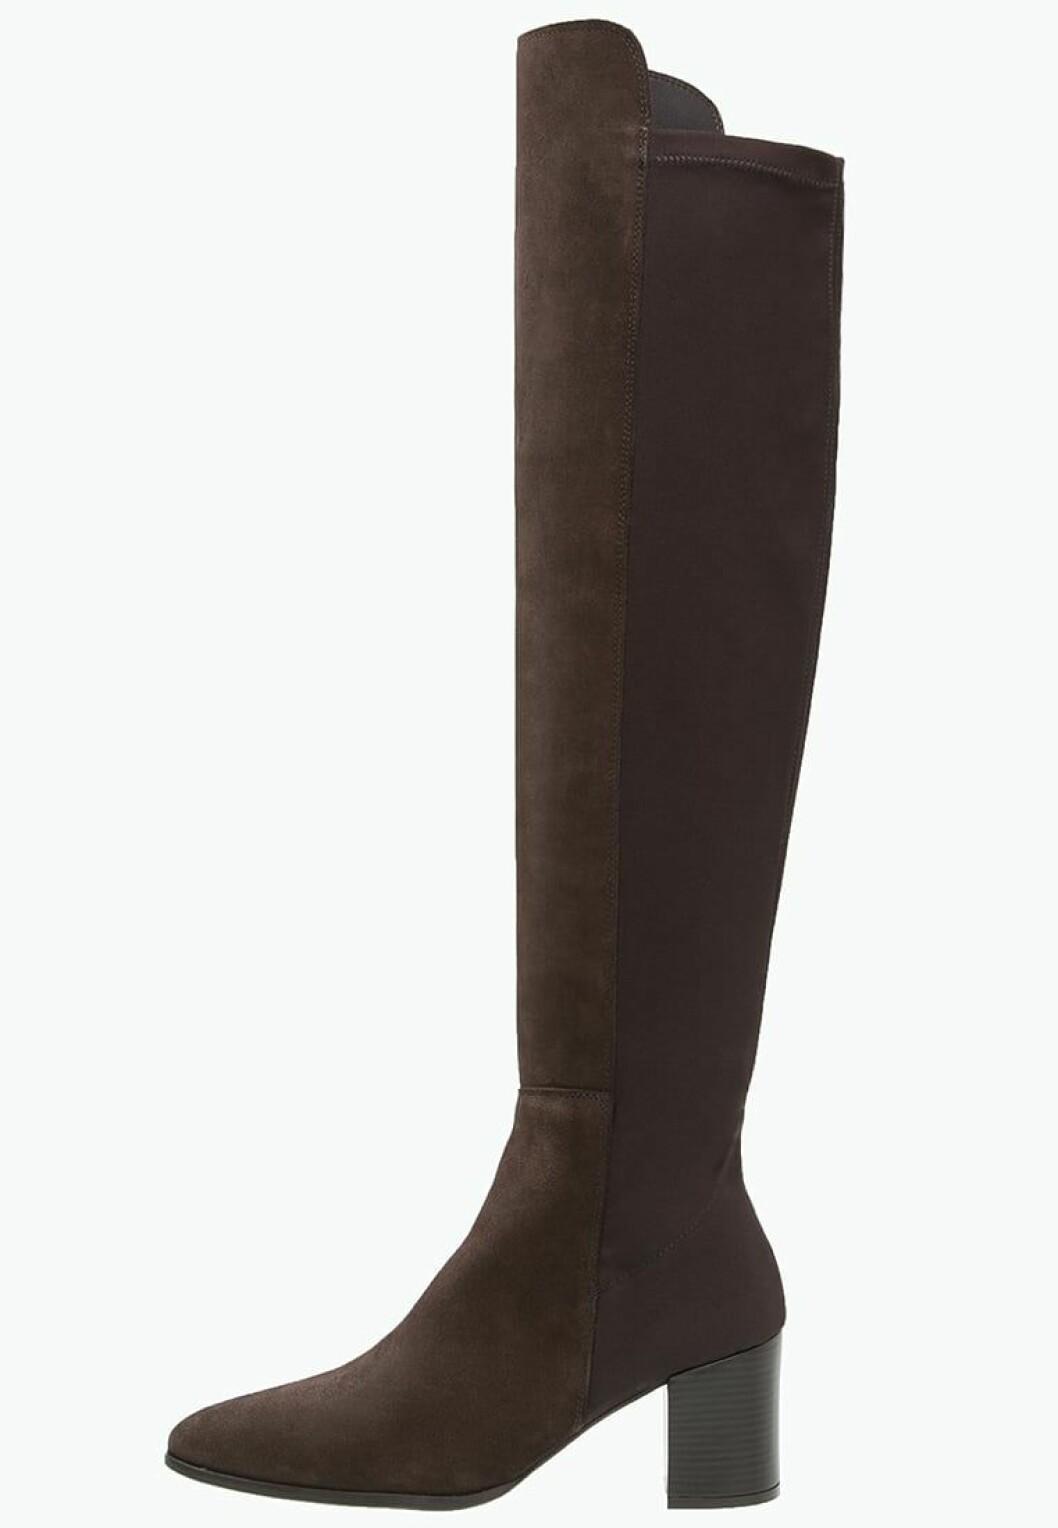 overknee morkbruna stovlar